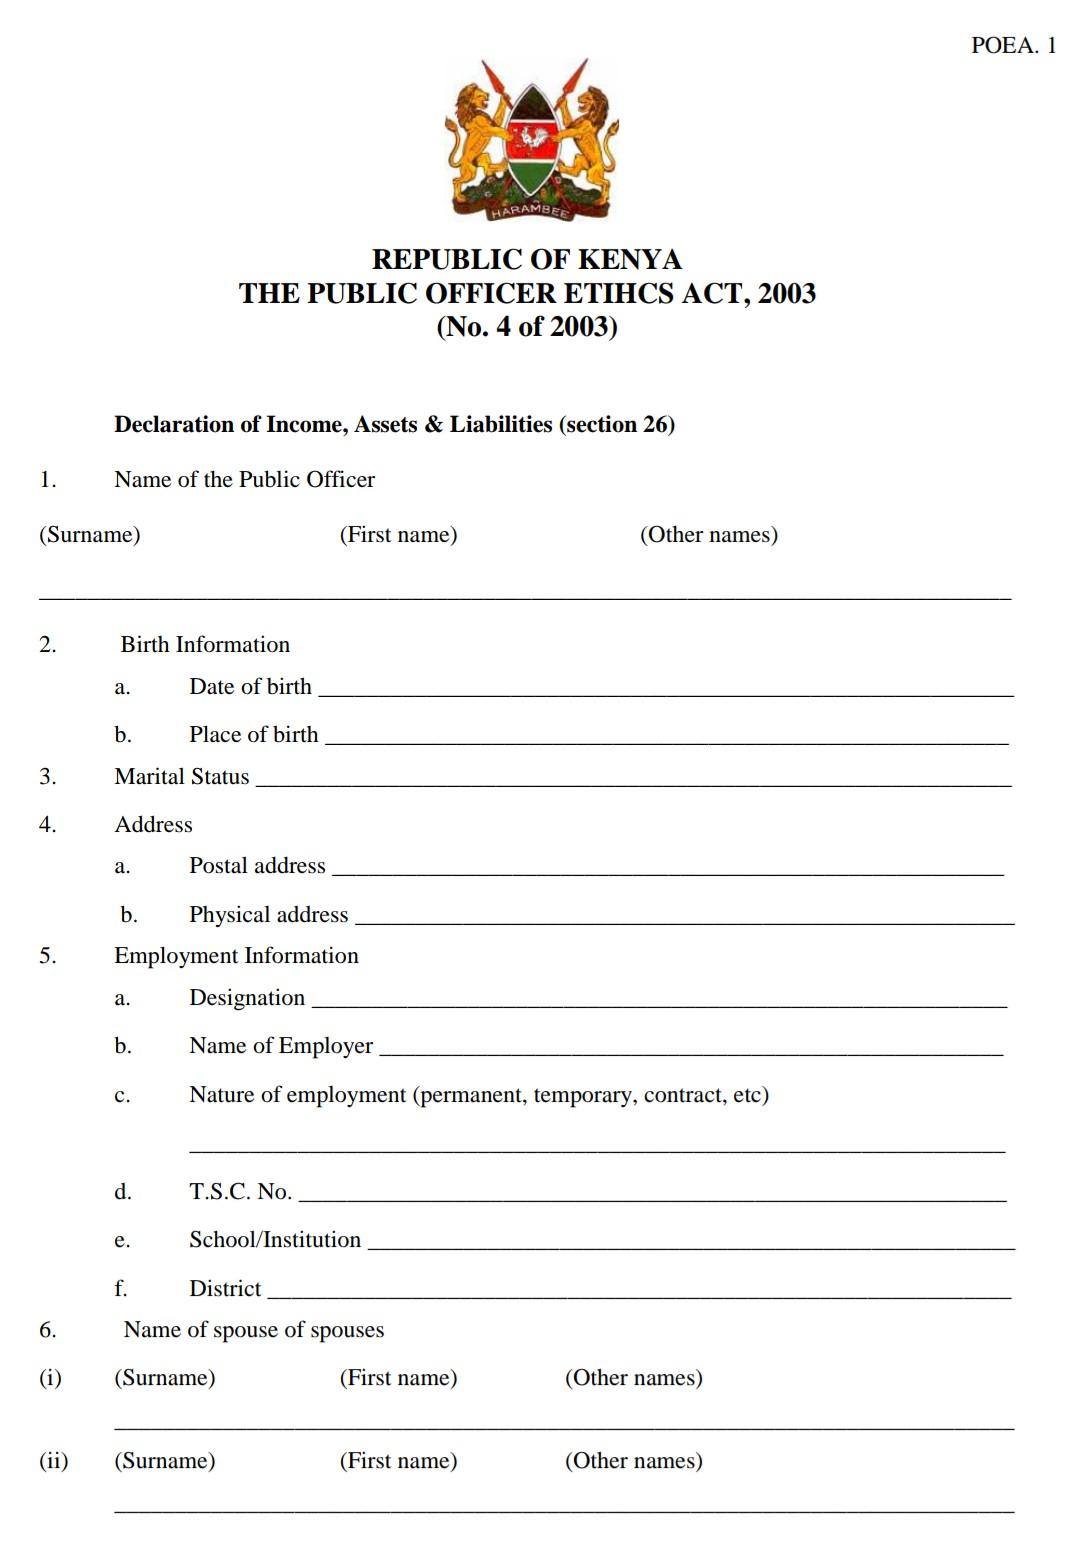 Wealth declaration form page 1